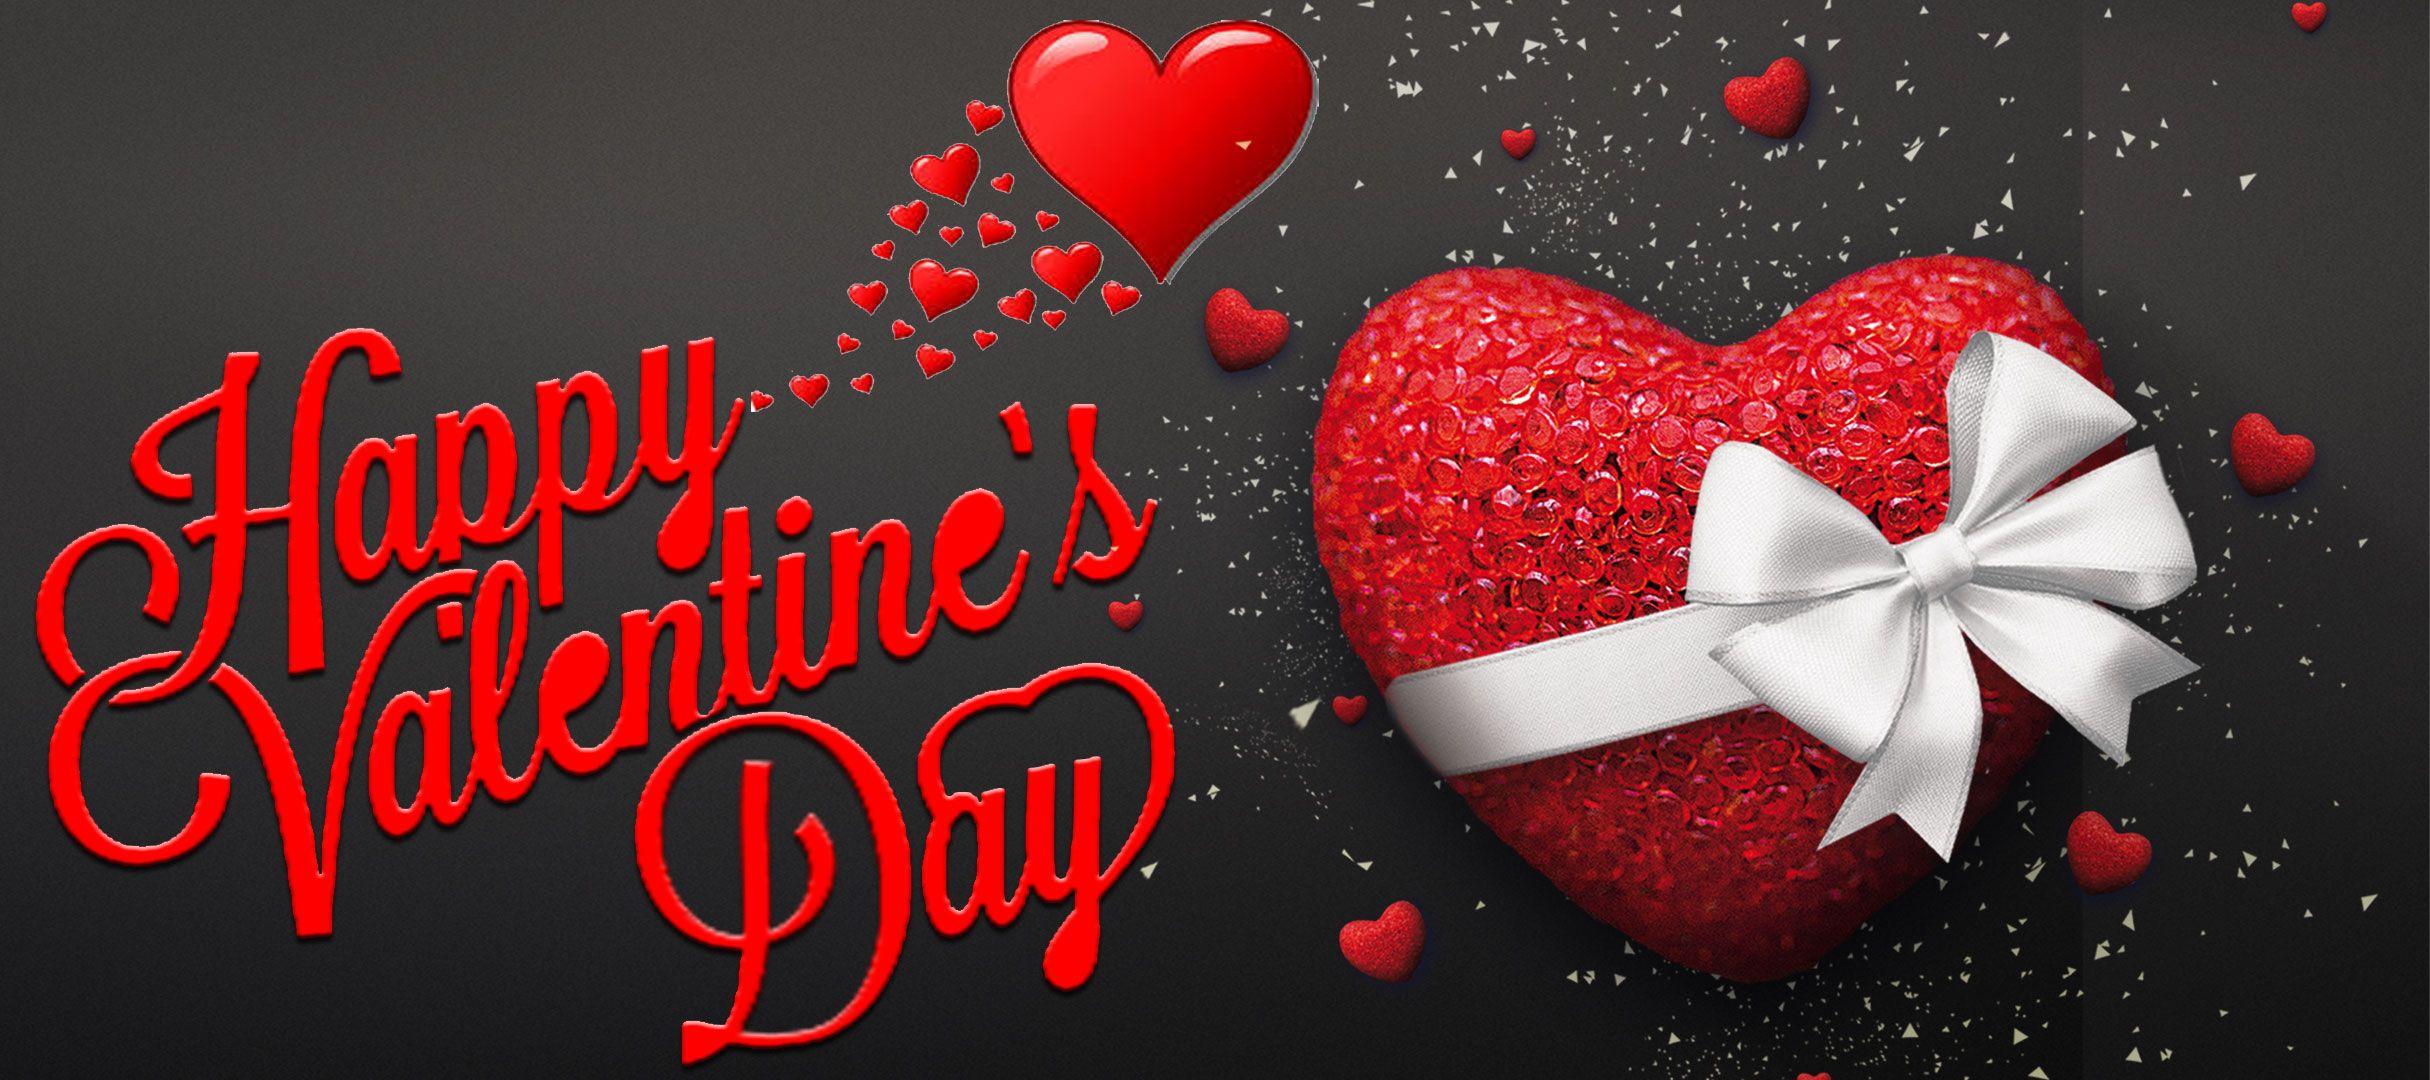 I Love You Status Romantic Whatsapp Video Valentines